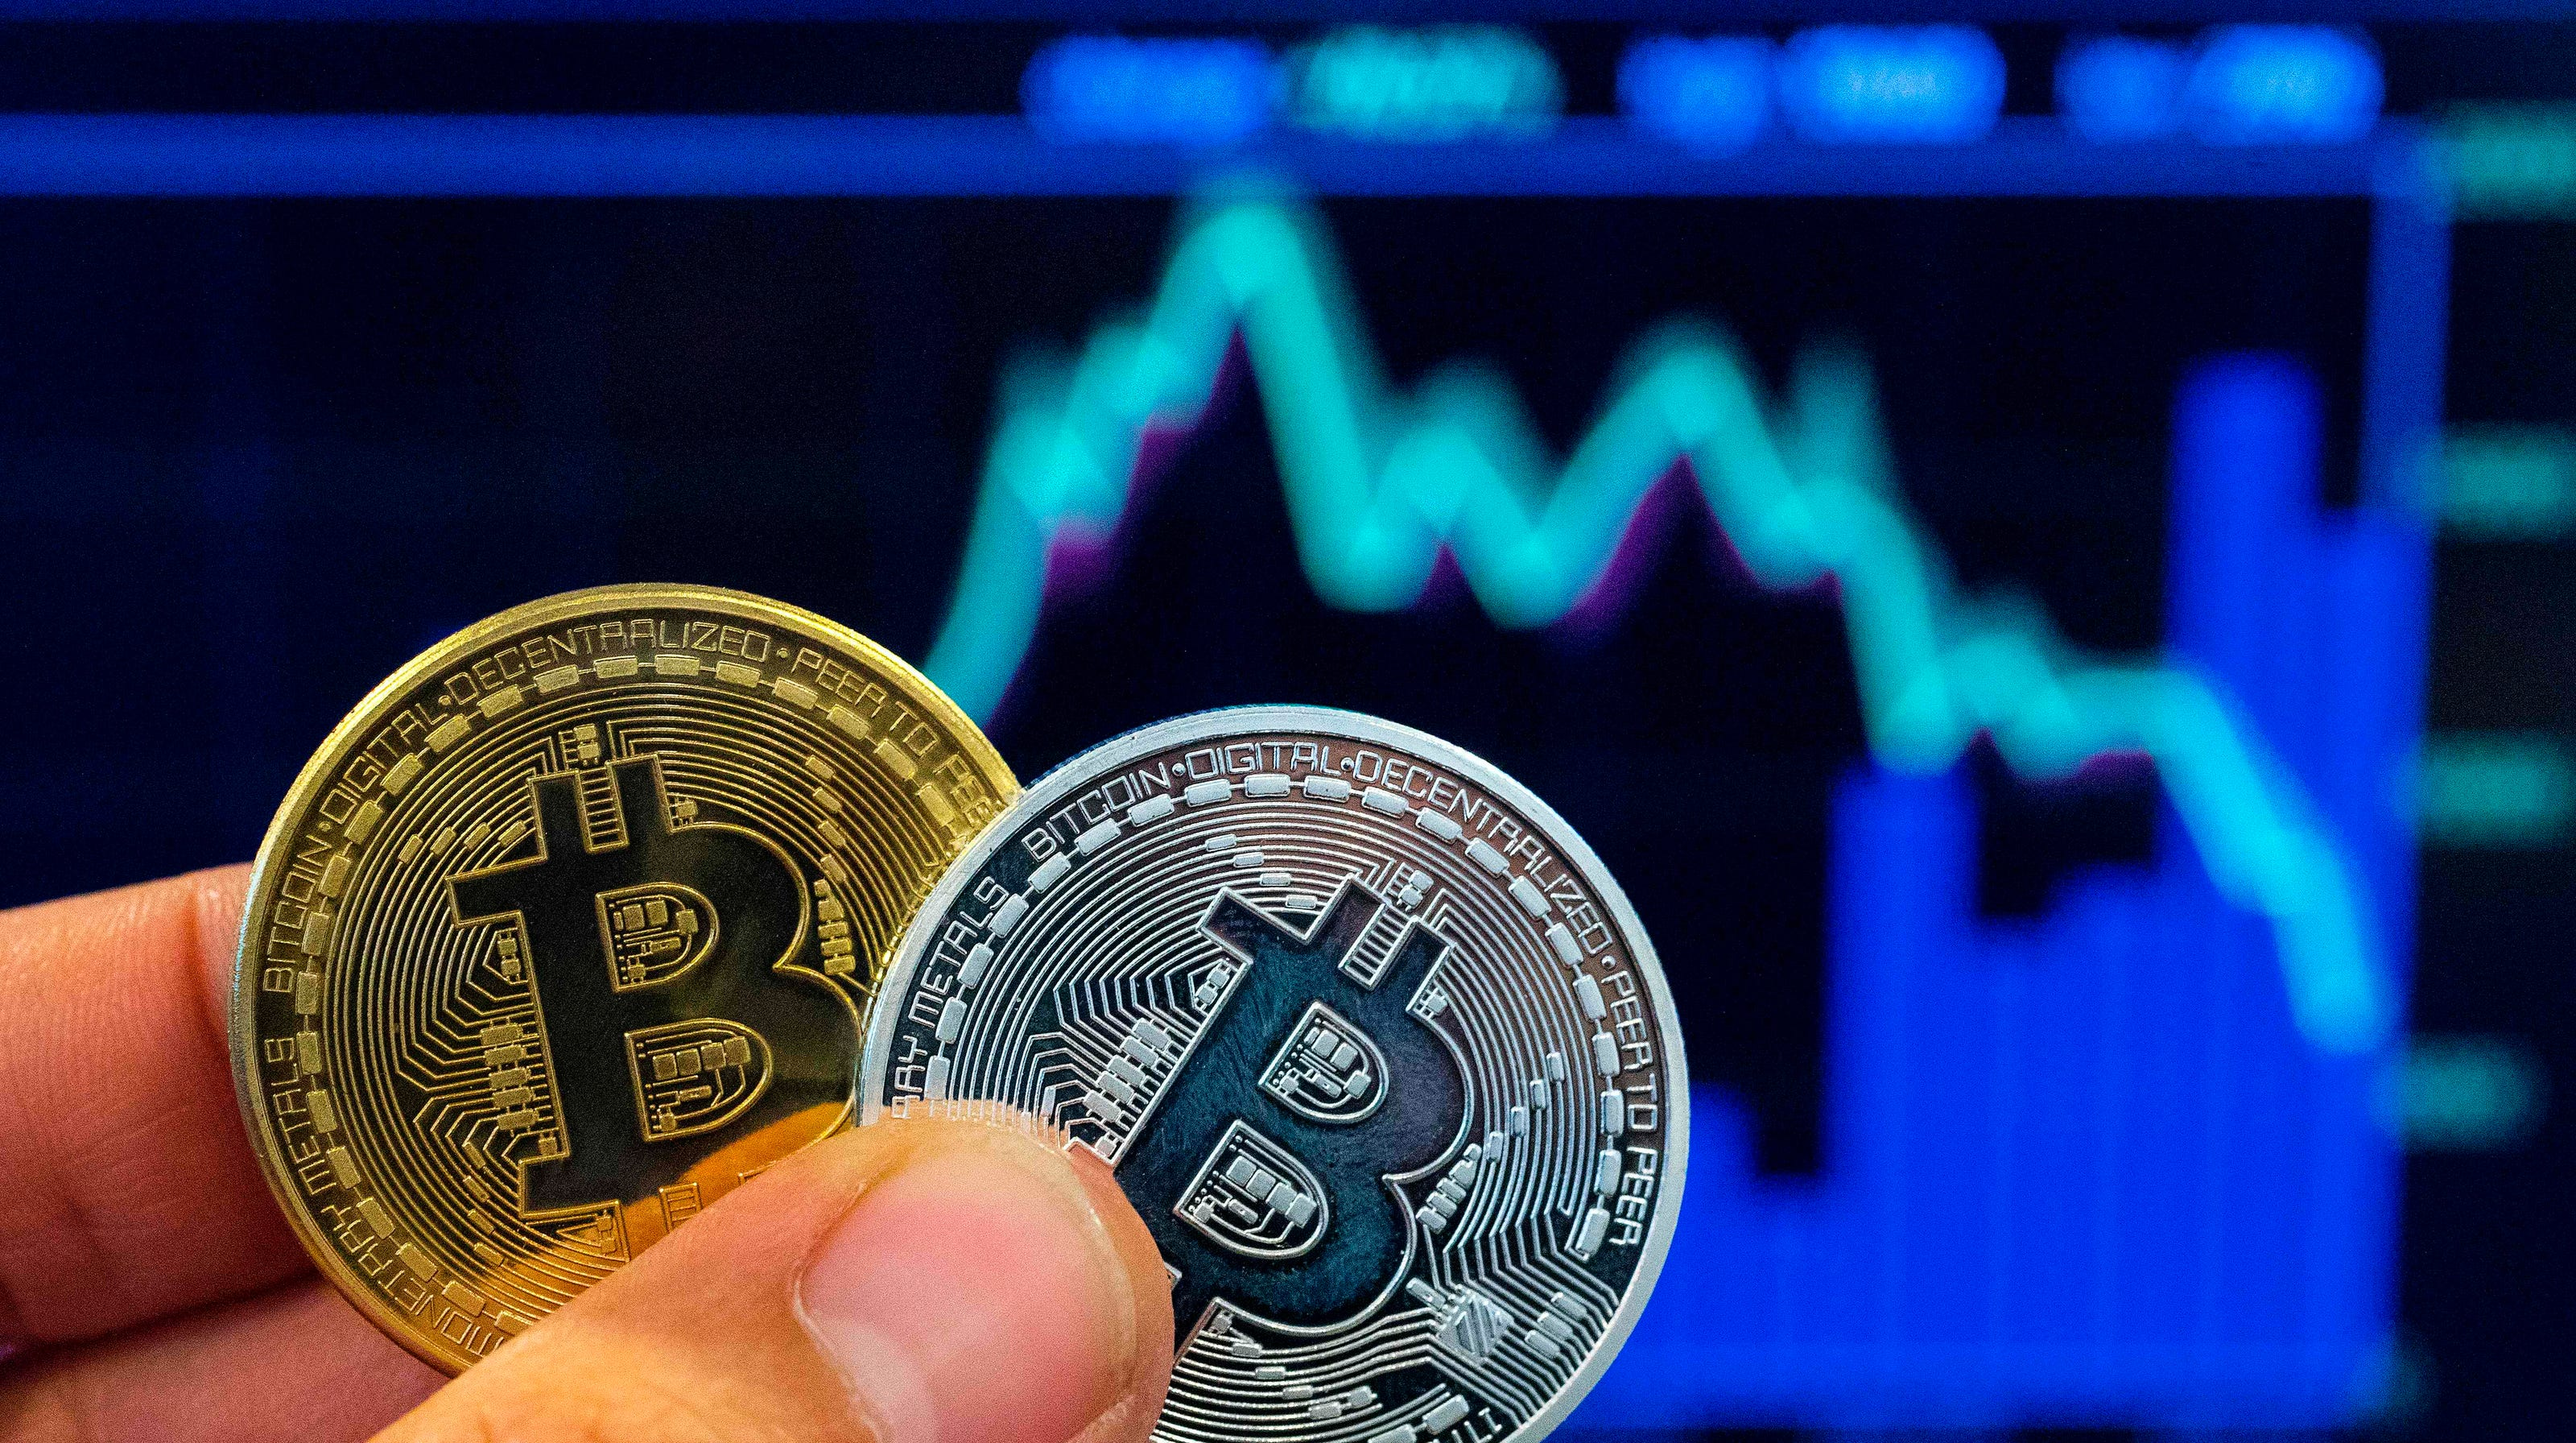 bitcoin exchange robbed